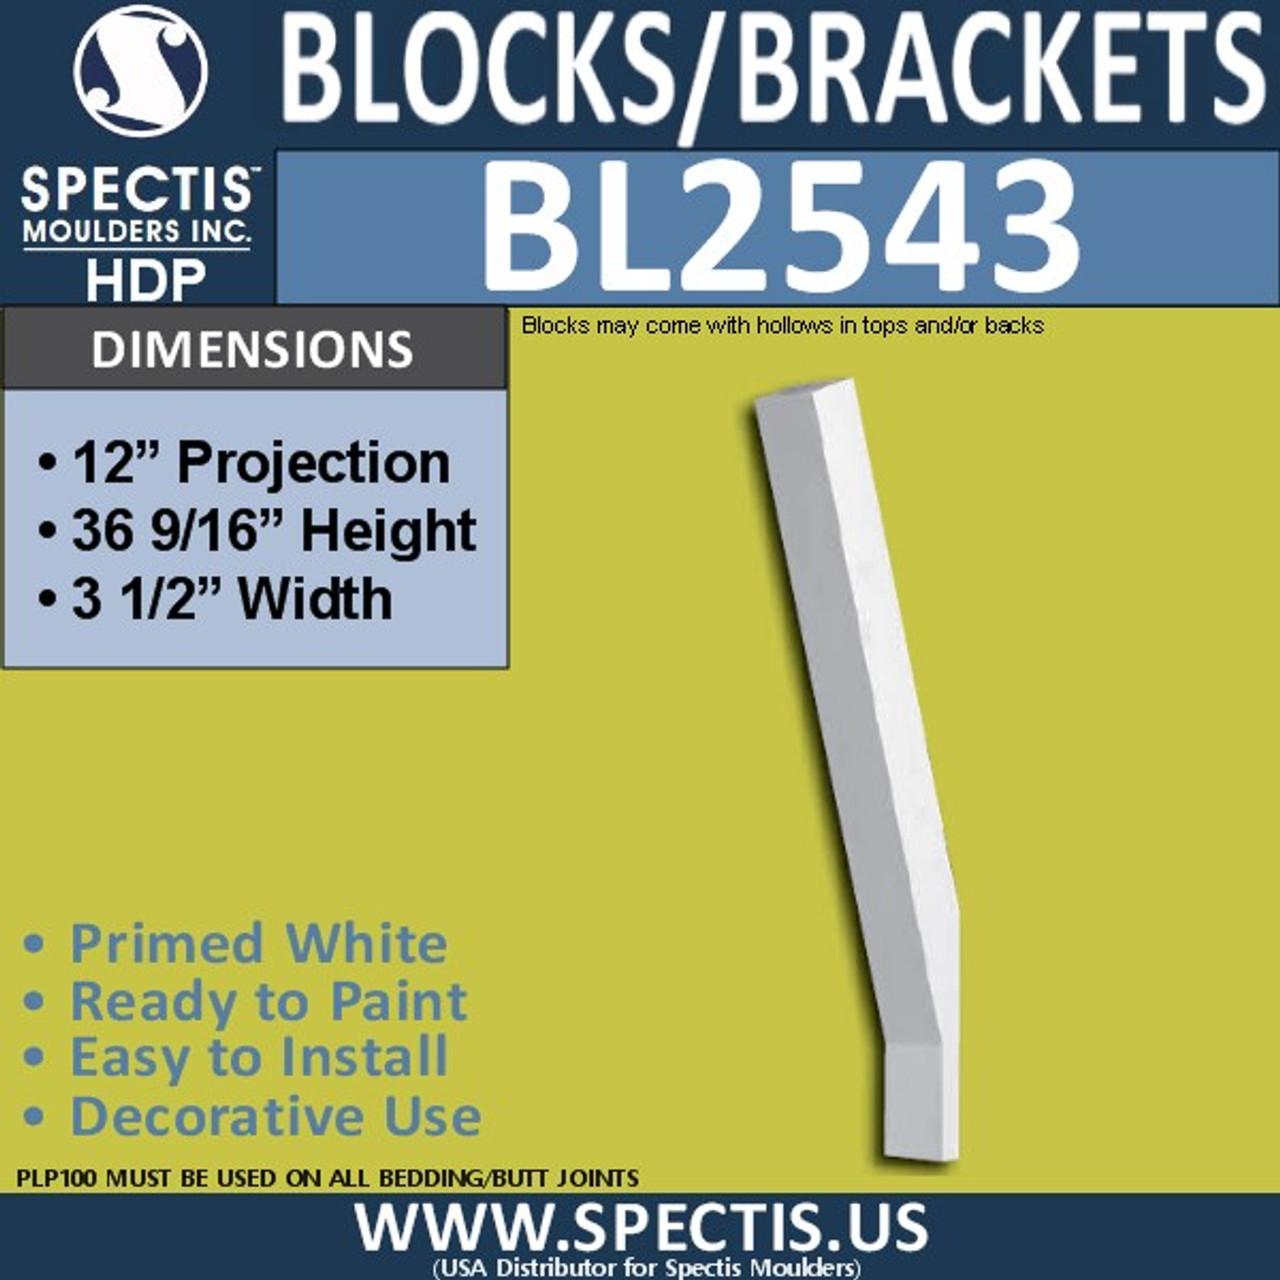 "BL2543 Eave Block or Bracket 3.5""W x 36.5""H x 12"" P"